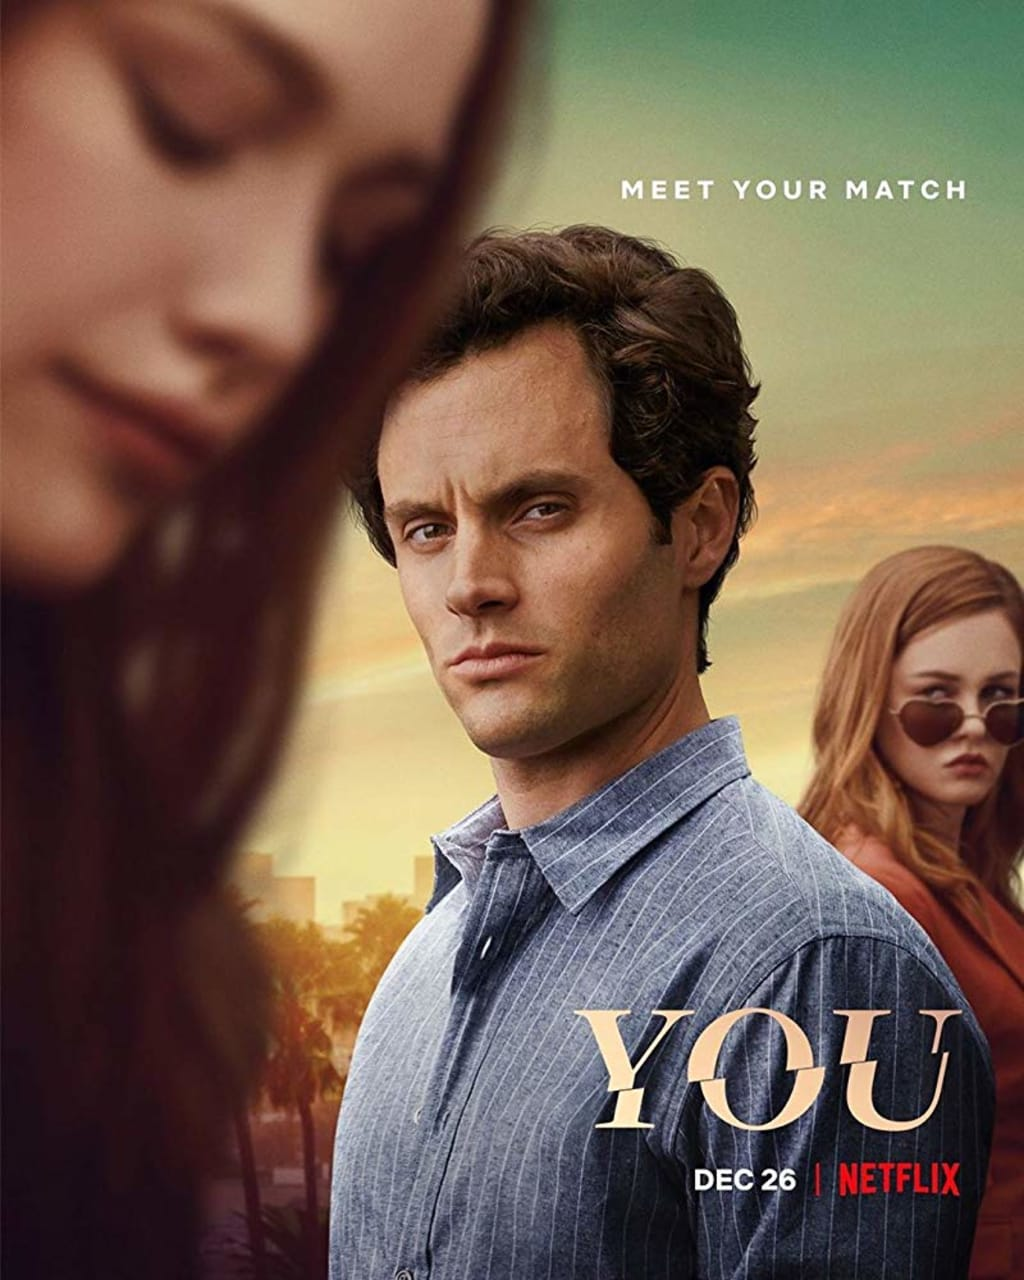 Review of 'You' Season 2